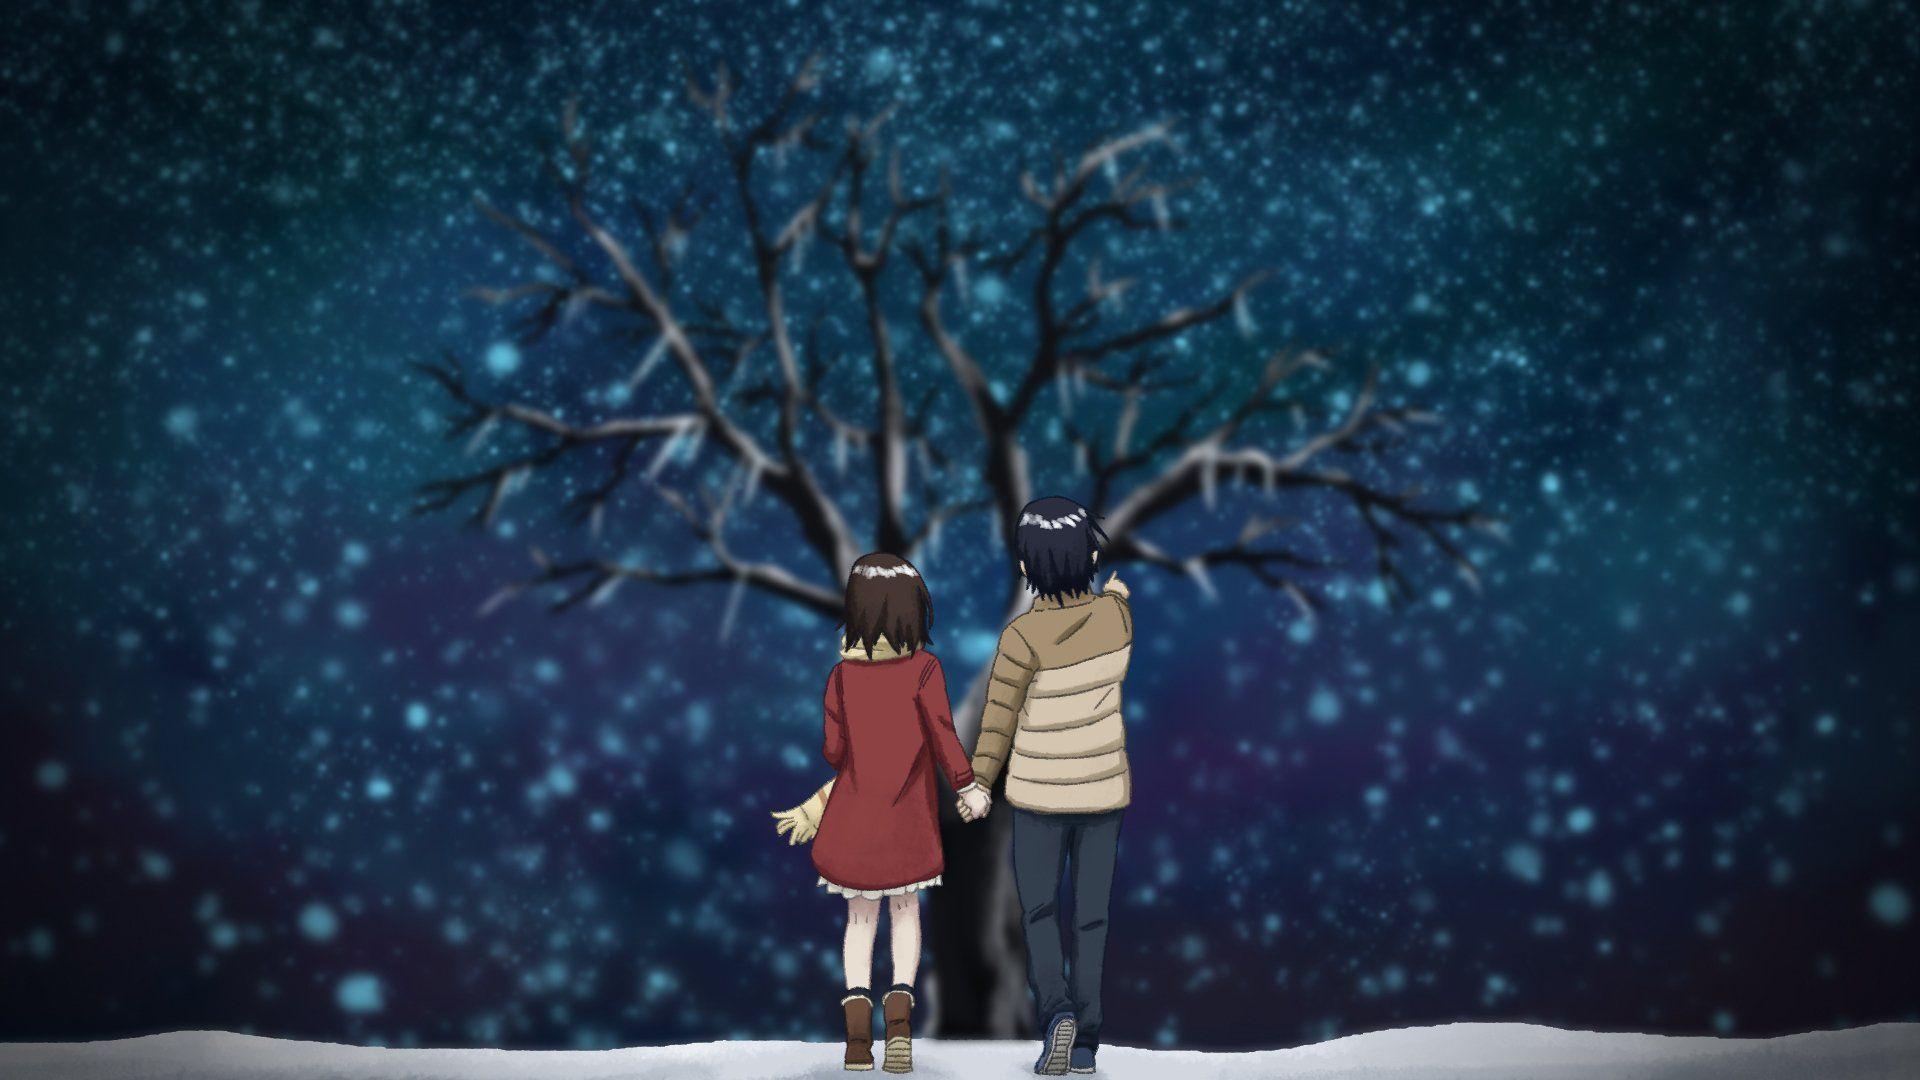 Anime Erased Kayo Hinazuki Satoru Fujinuma Wallpaper Anime Kawaii Anime Anime Images